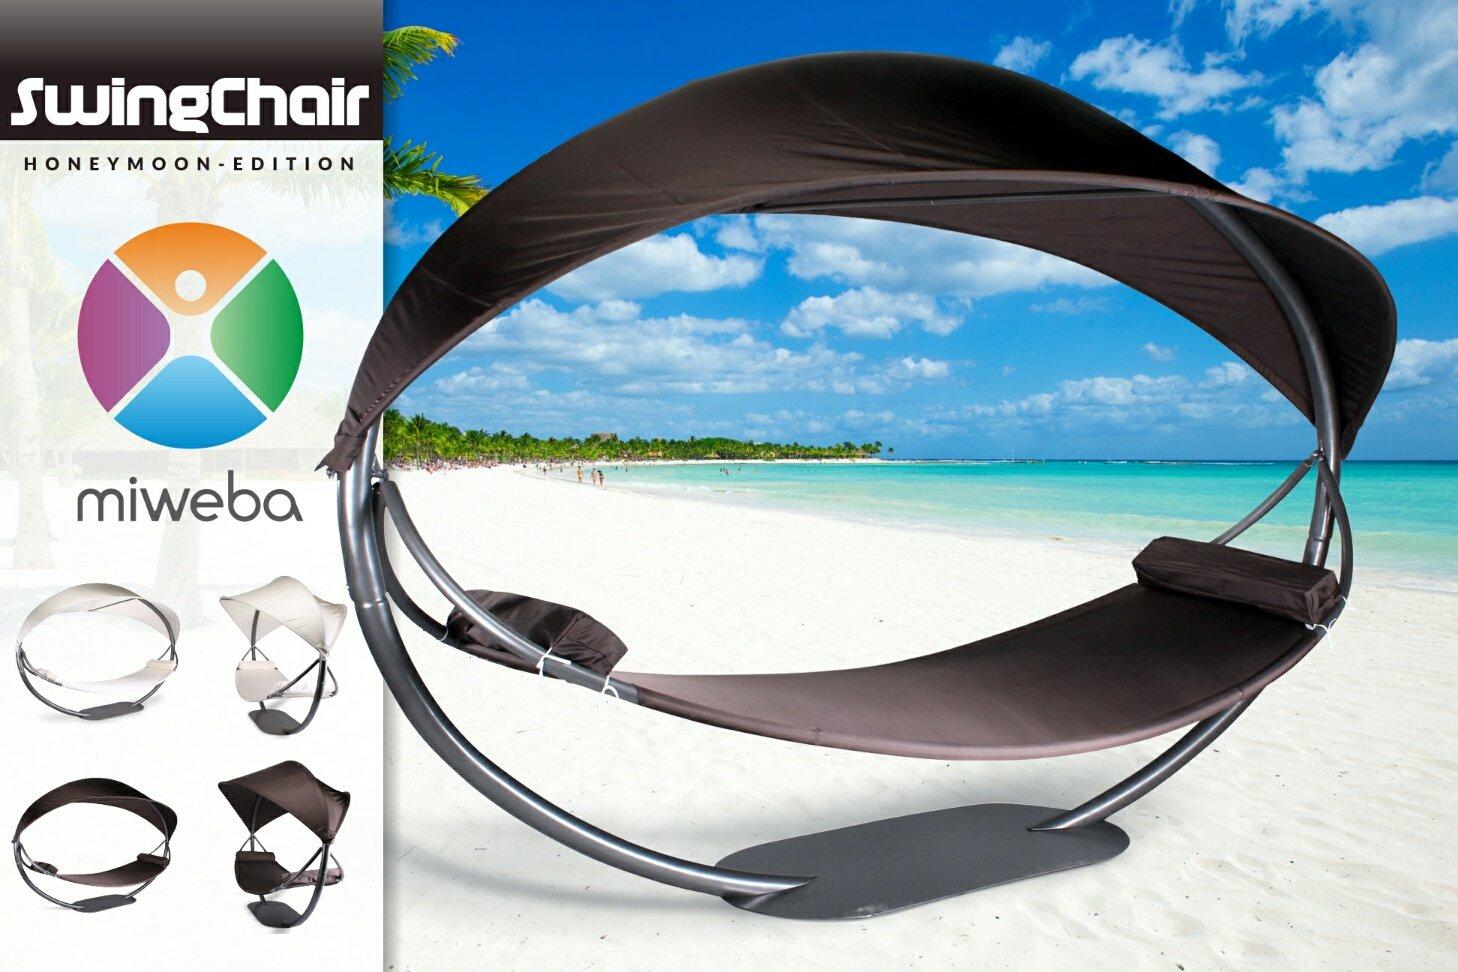 Miweba Swing Chair HONEY MOON Hollywood Schaukel Hängestuhl Liege Sonnenliege (braun)